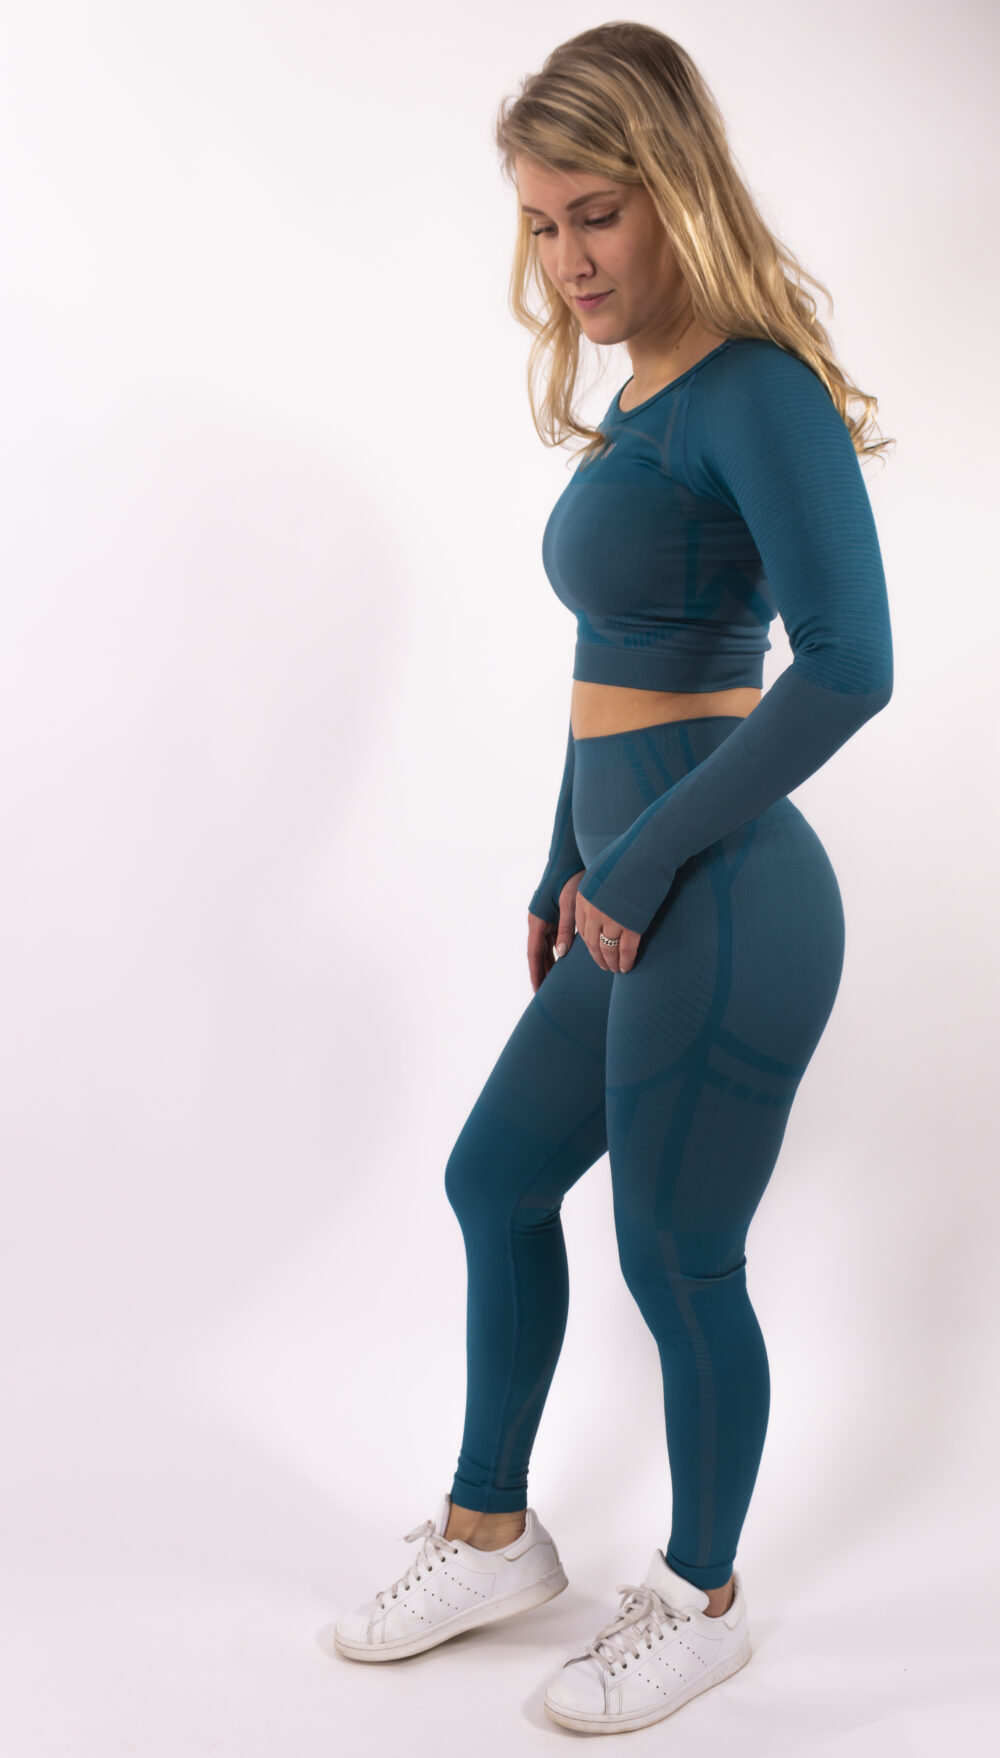 a/w smaragd set woman nutrition